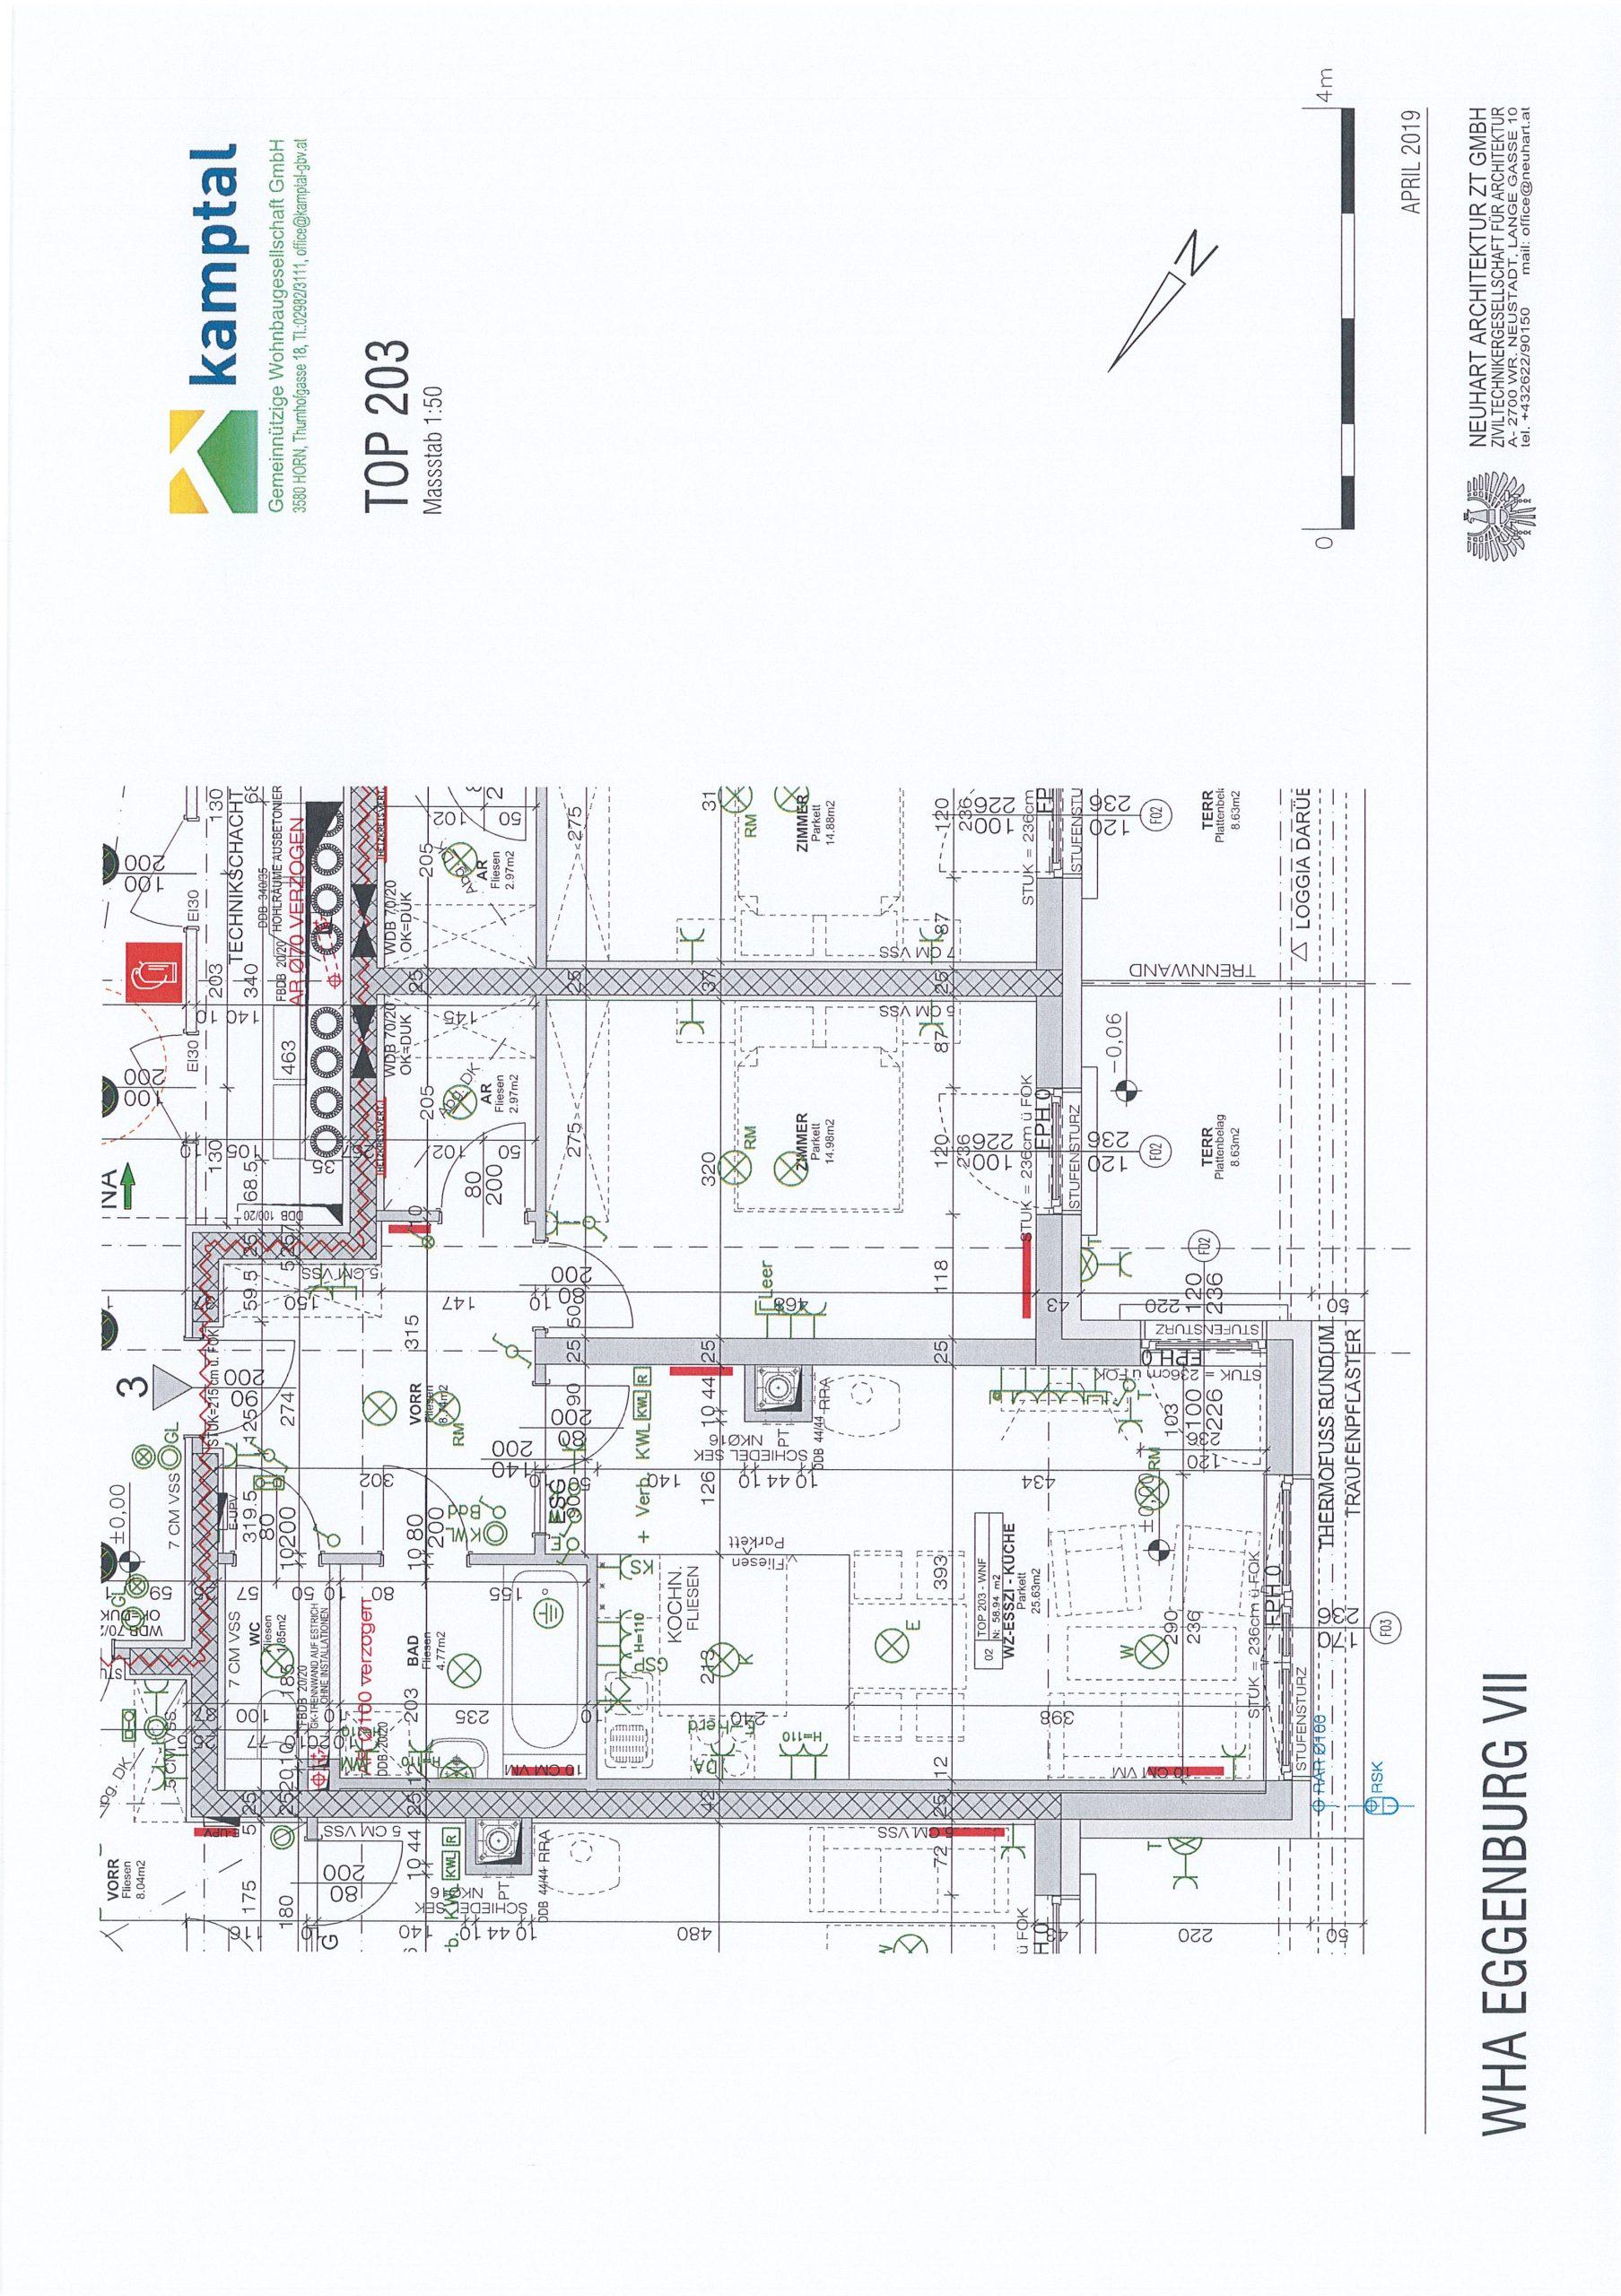 Immobilie von Kamptal in 3730 Eggenburg, Horn, Eggenburg VII - Top 203 #8